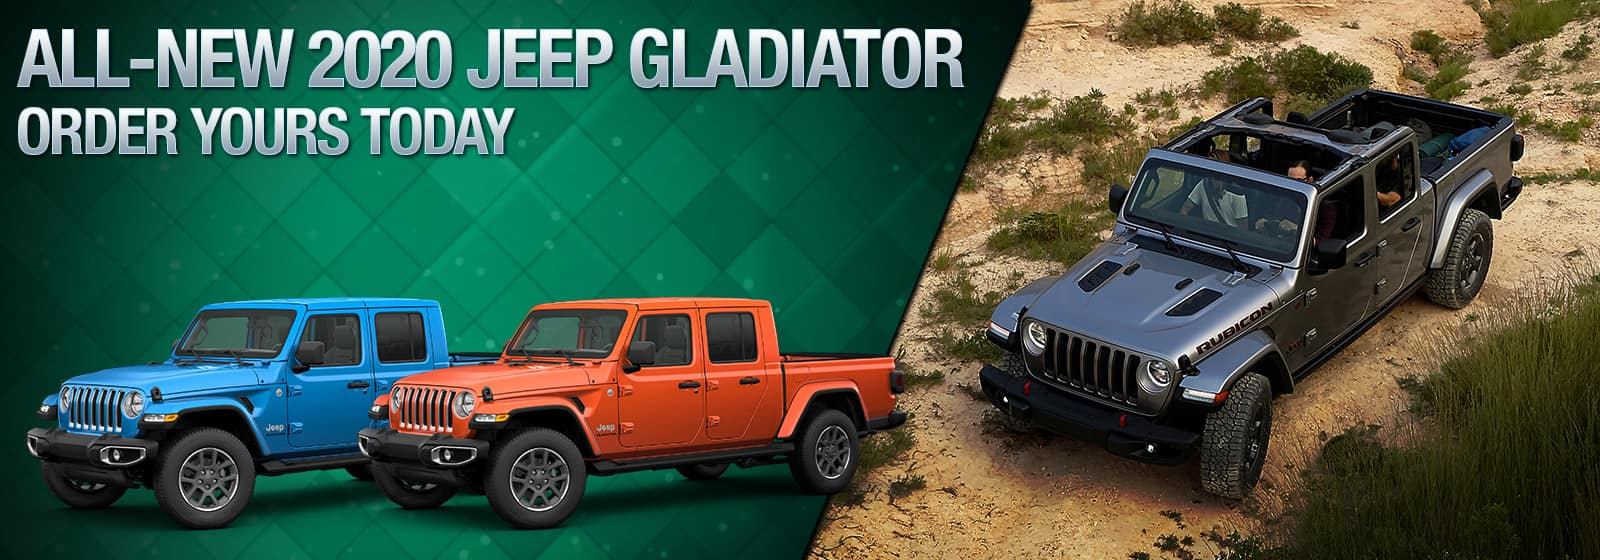 2020 Jeep Gladiator Pre-Order banner